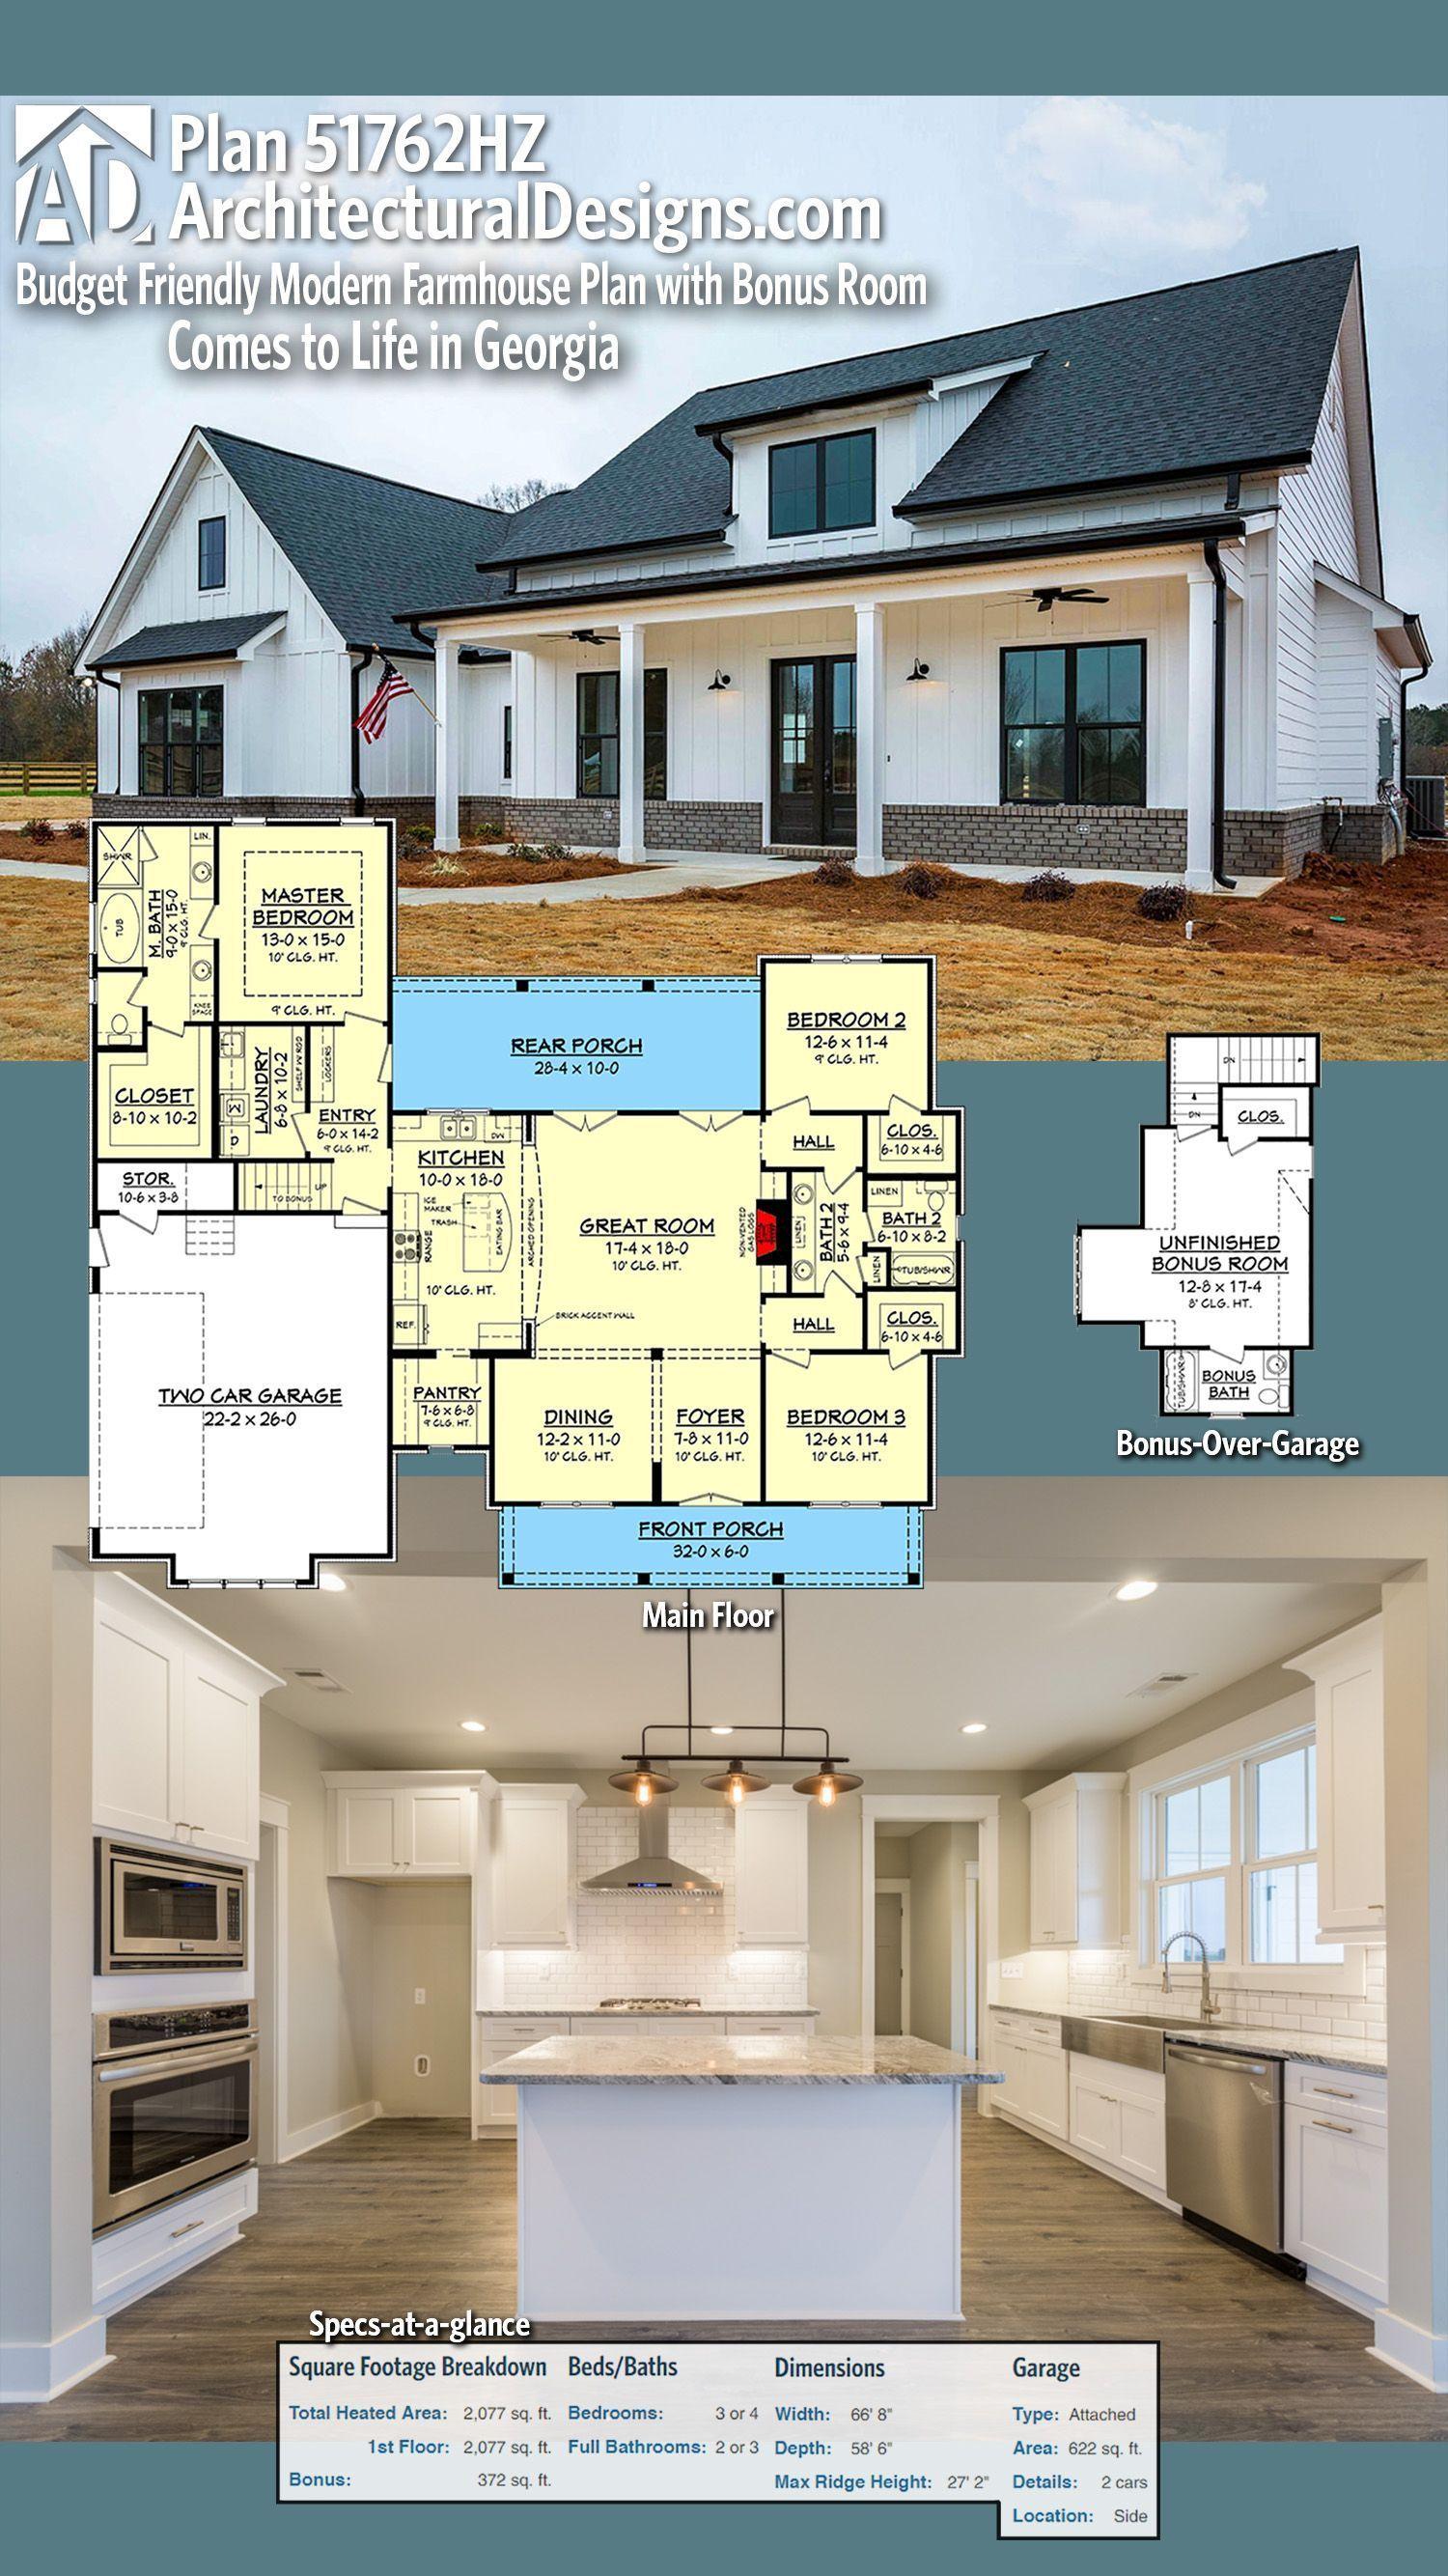 Wonderful Architectural Designs House Plan 51762HZ Client Built In Georgia. 3+BR, 2